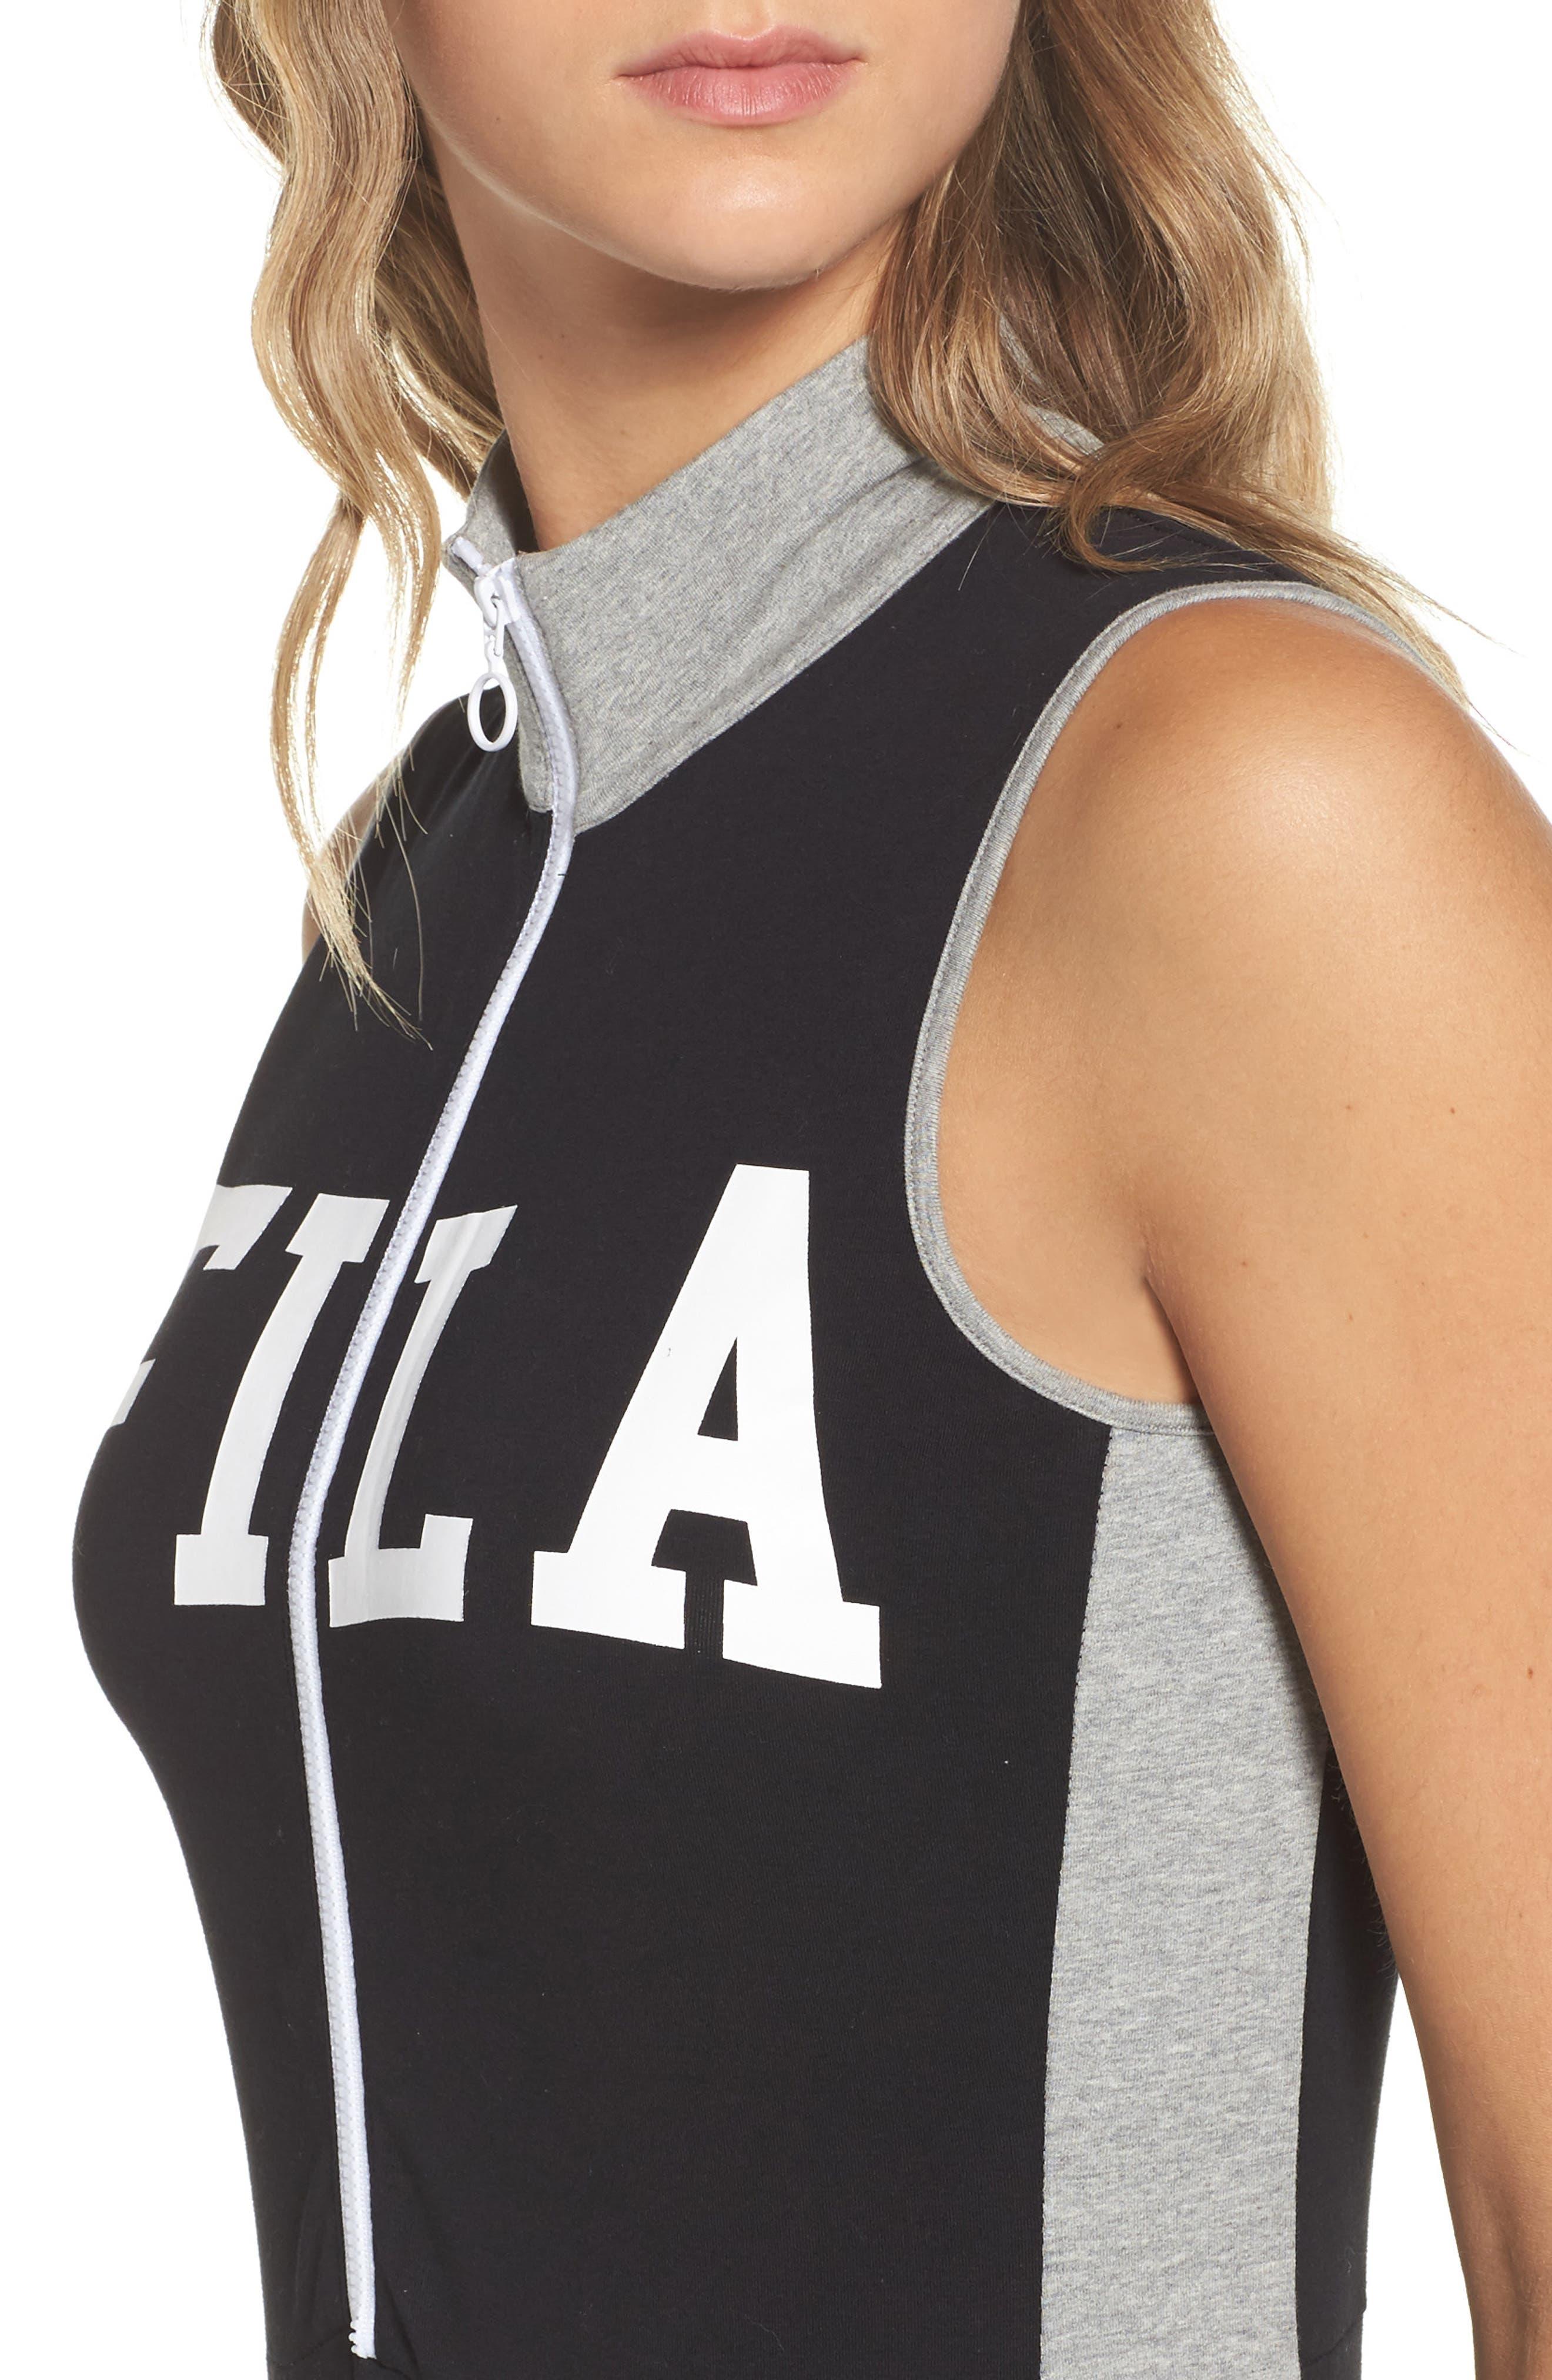 Roseann Jumpsuit,                             Alternate thumbnail 4, color,                             Black/ Grey Heather/ White